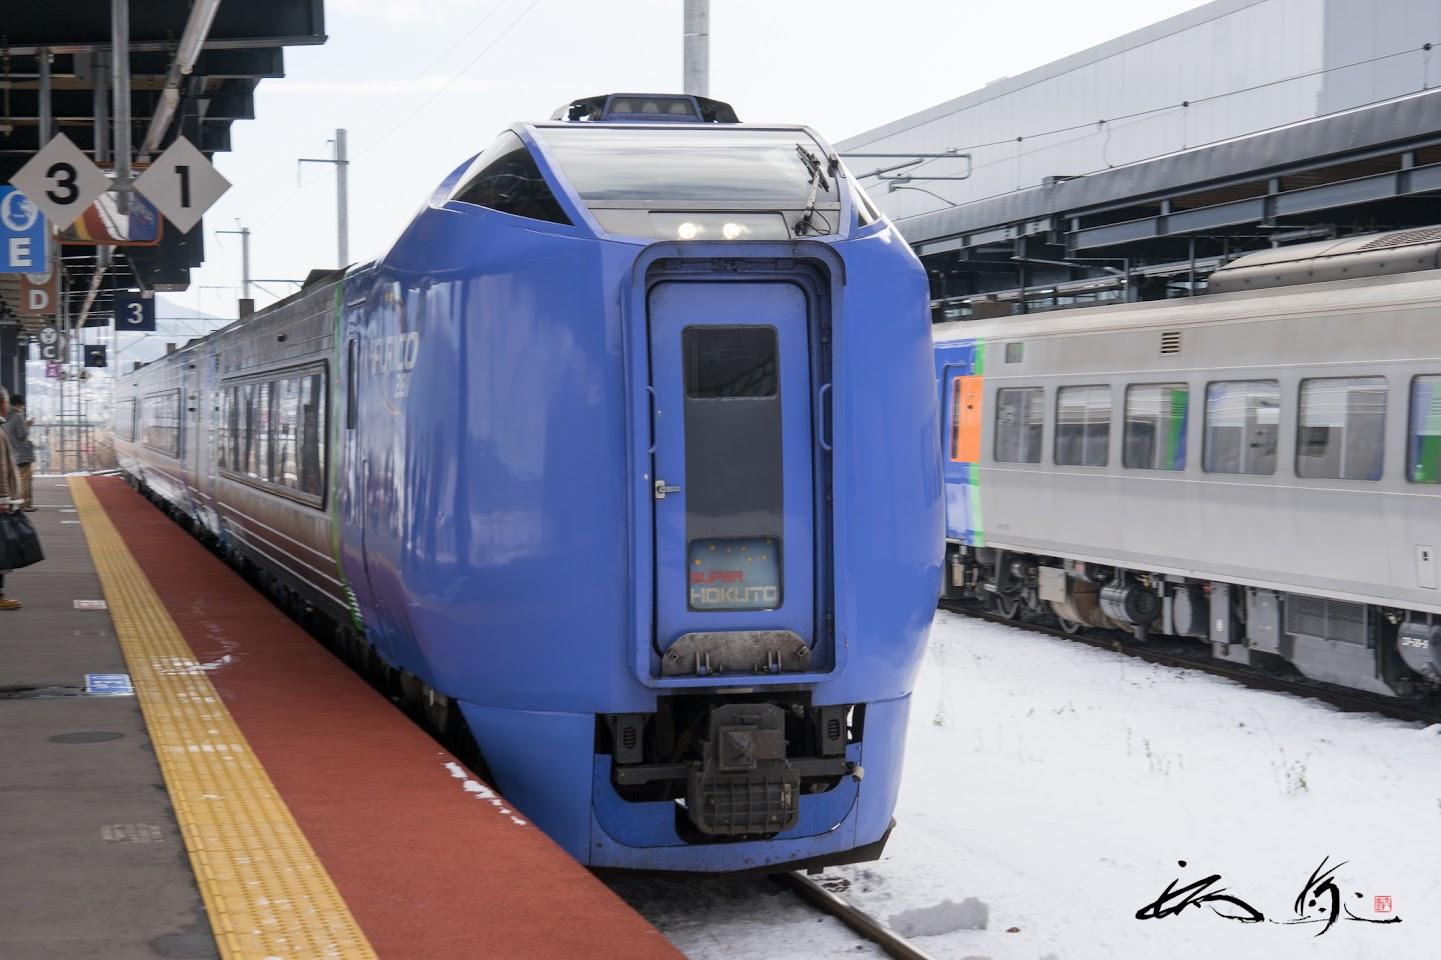 特急スーパー北斗7号